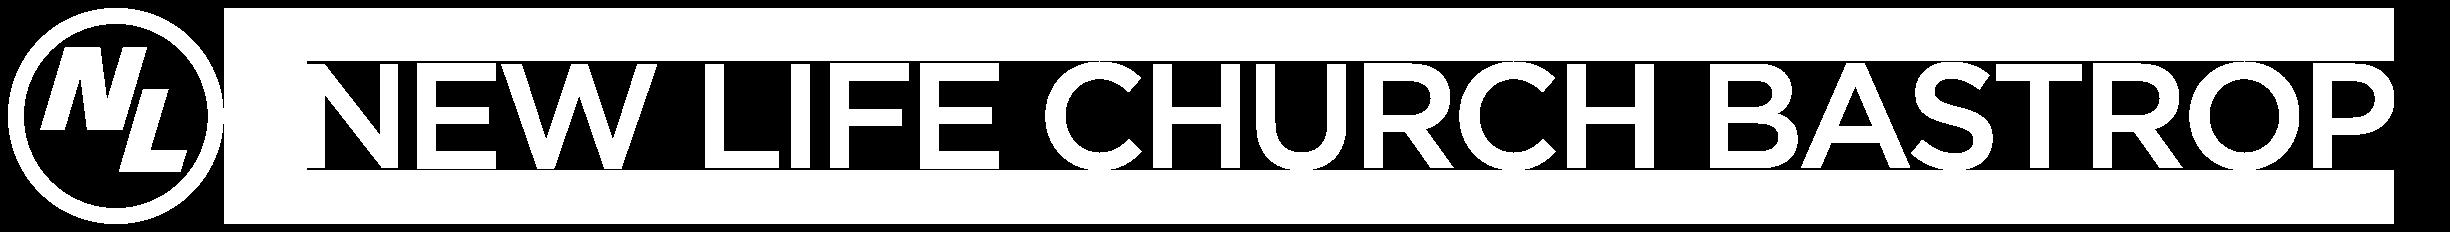 New Life Church Bastrop